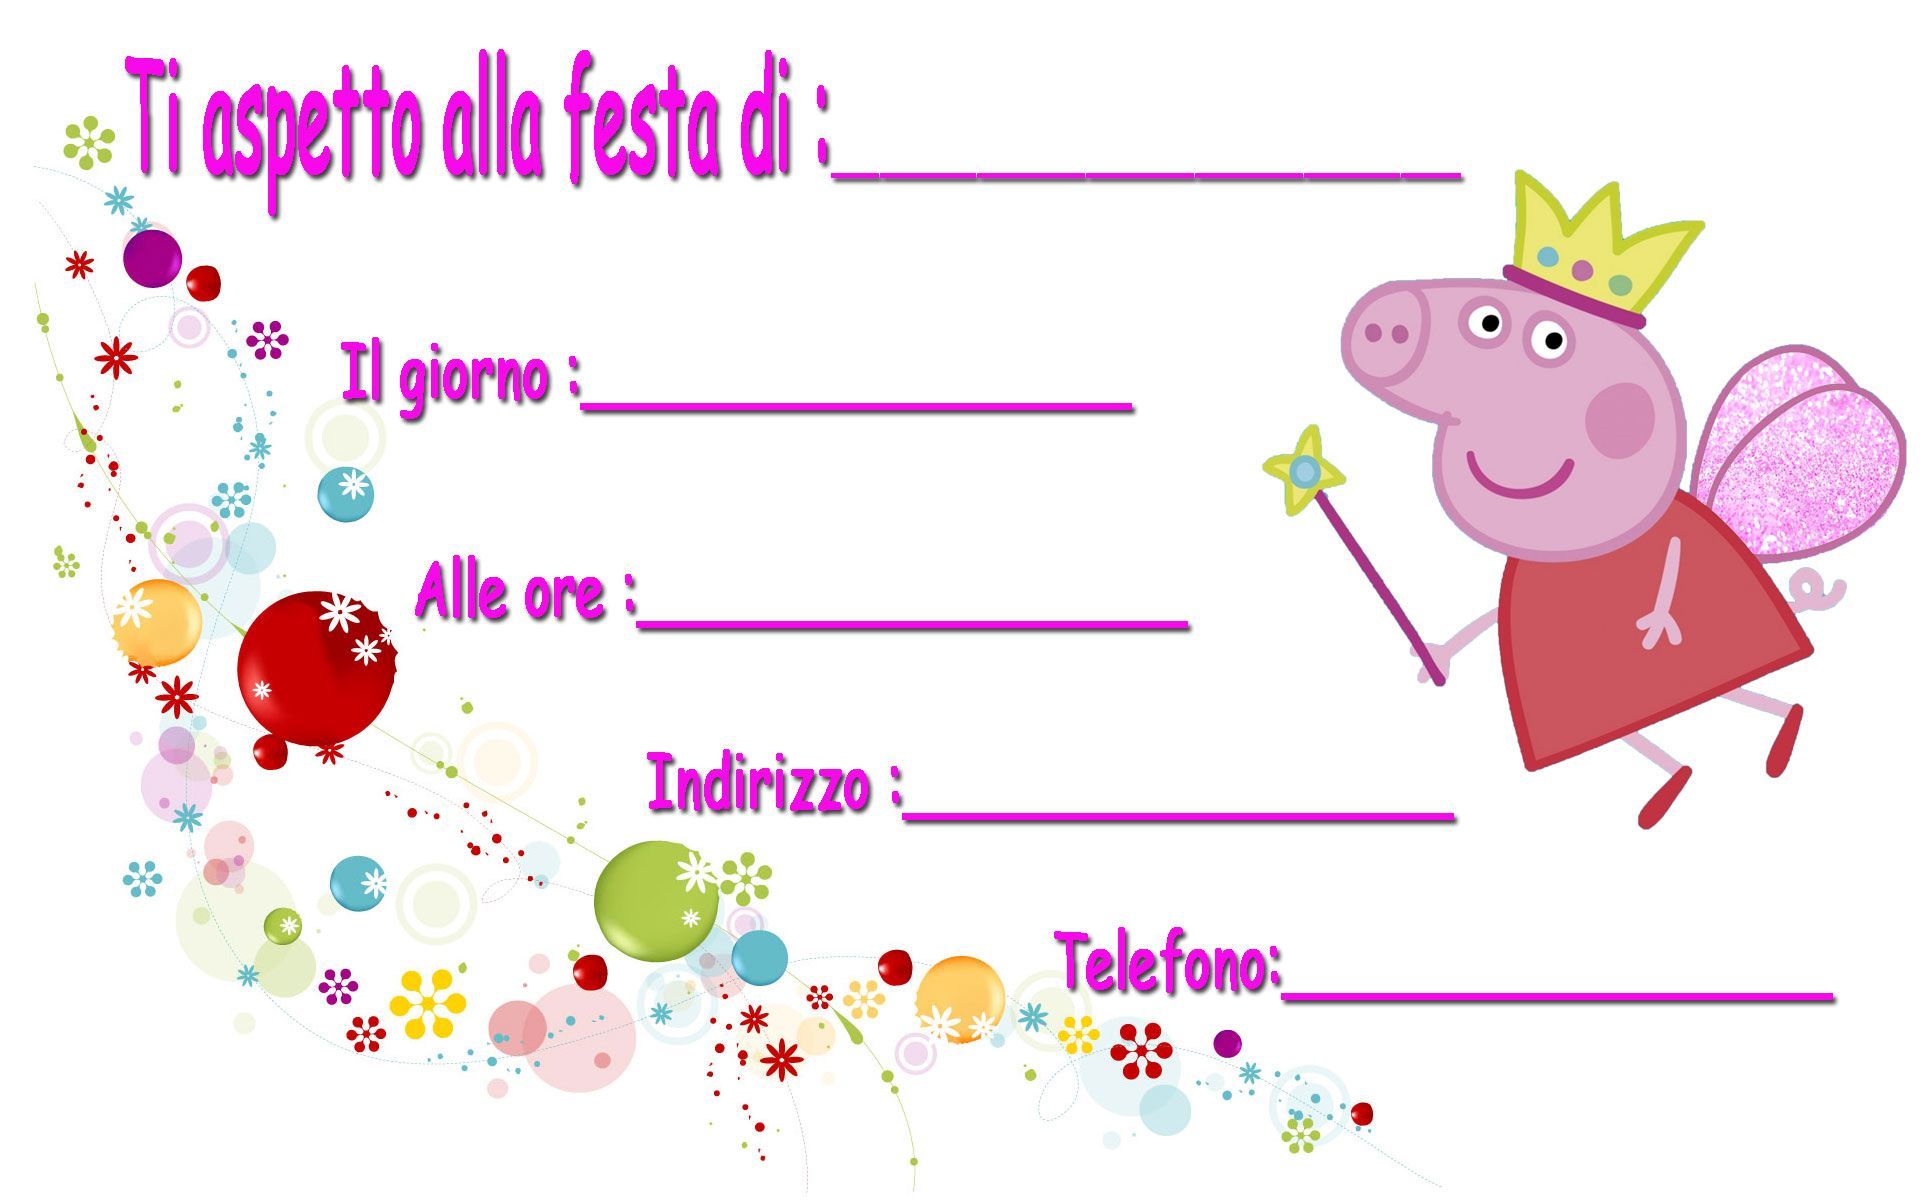 spesso inviti festa peppa pig scaricali gratis http://www.lefestediemma  XR32